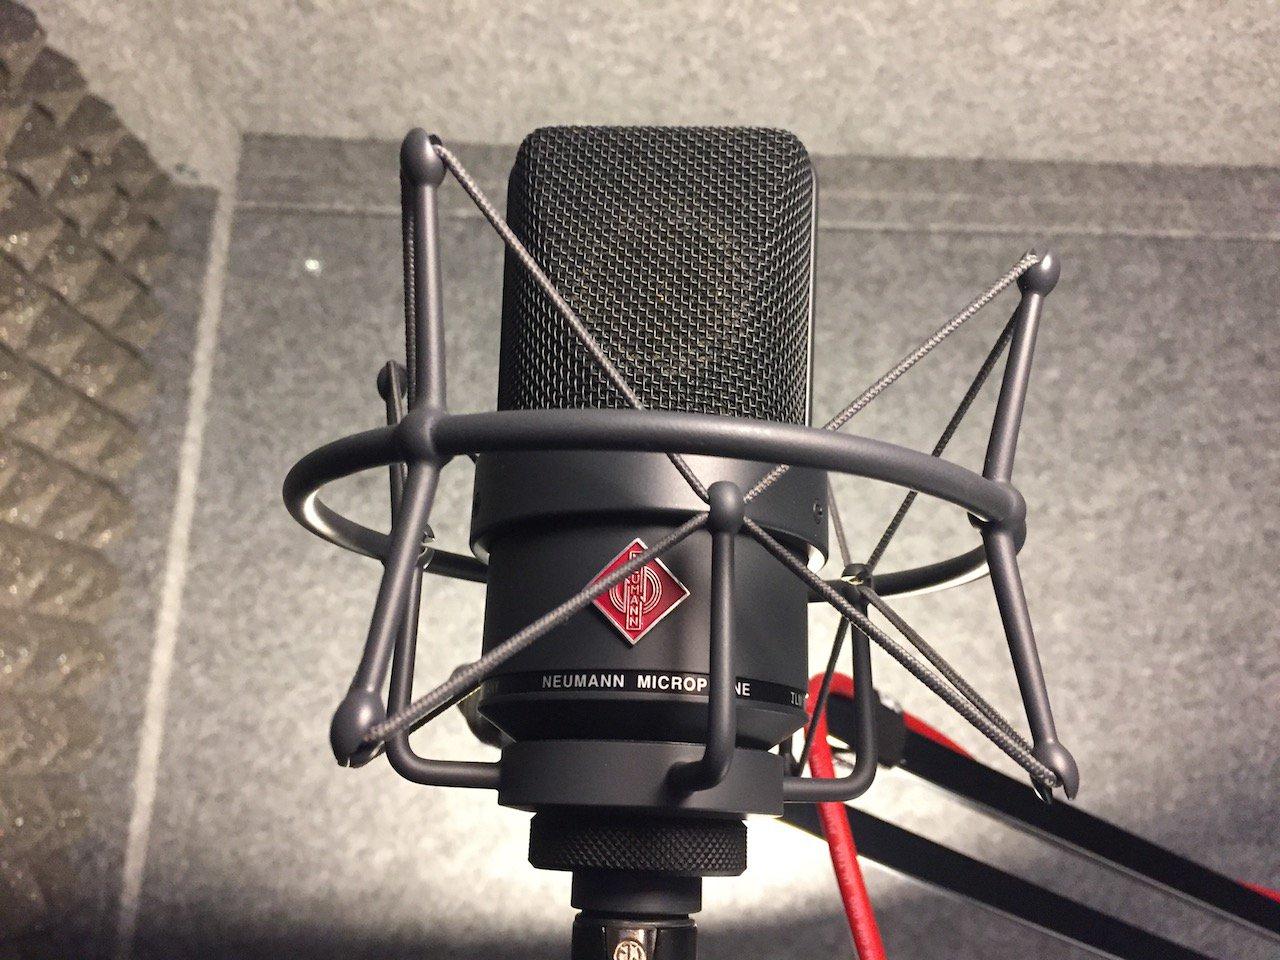 Neumann TLM 103 Microphone (Black Model)